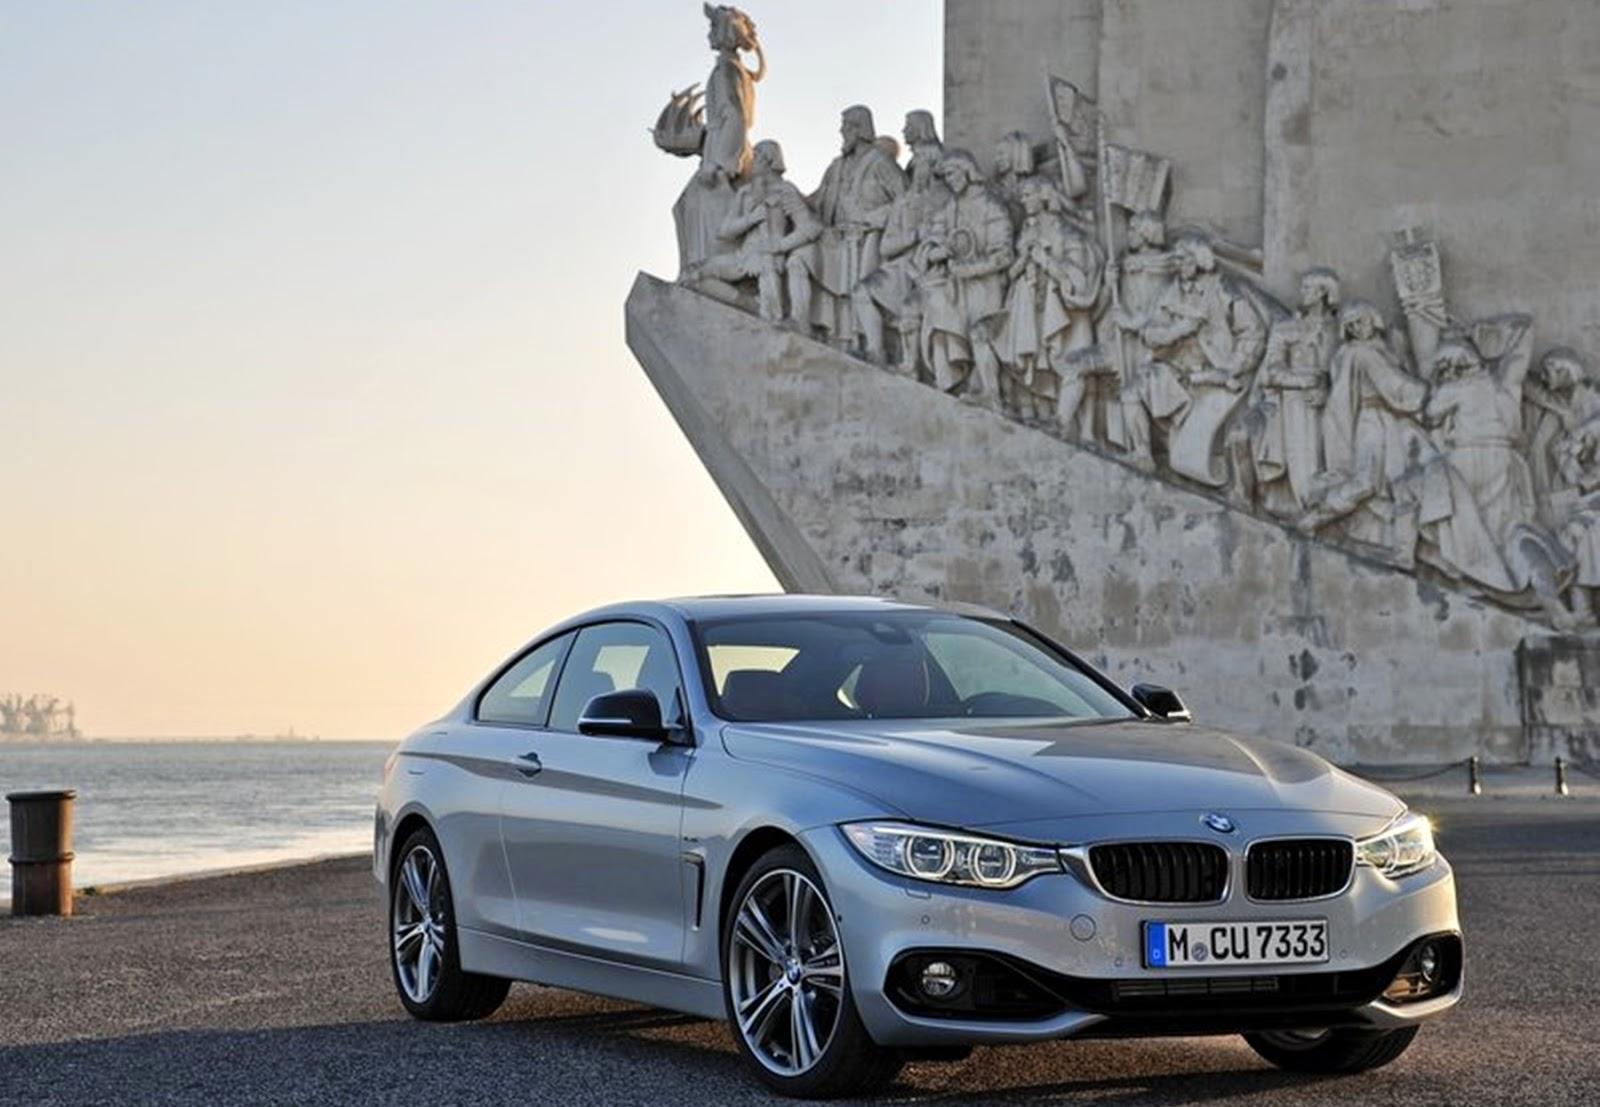 Carro - BMW 435i Coupe (2014)